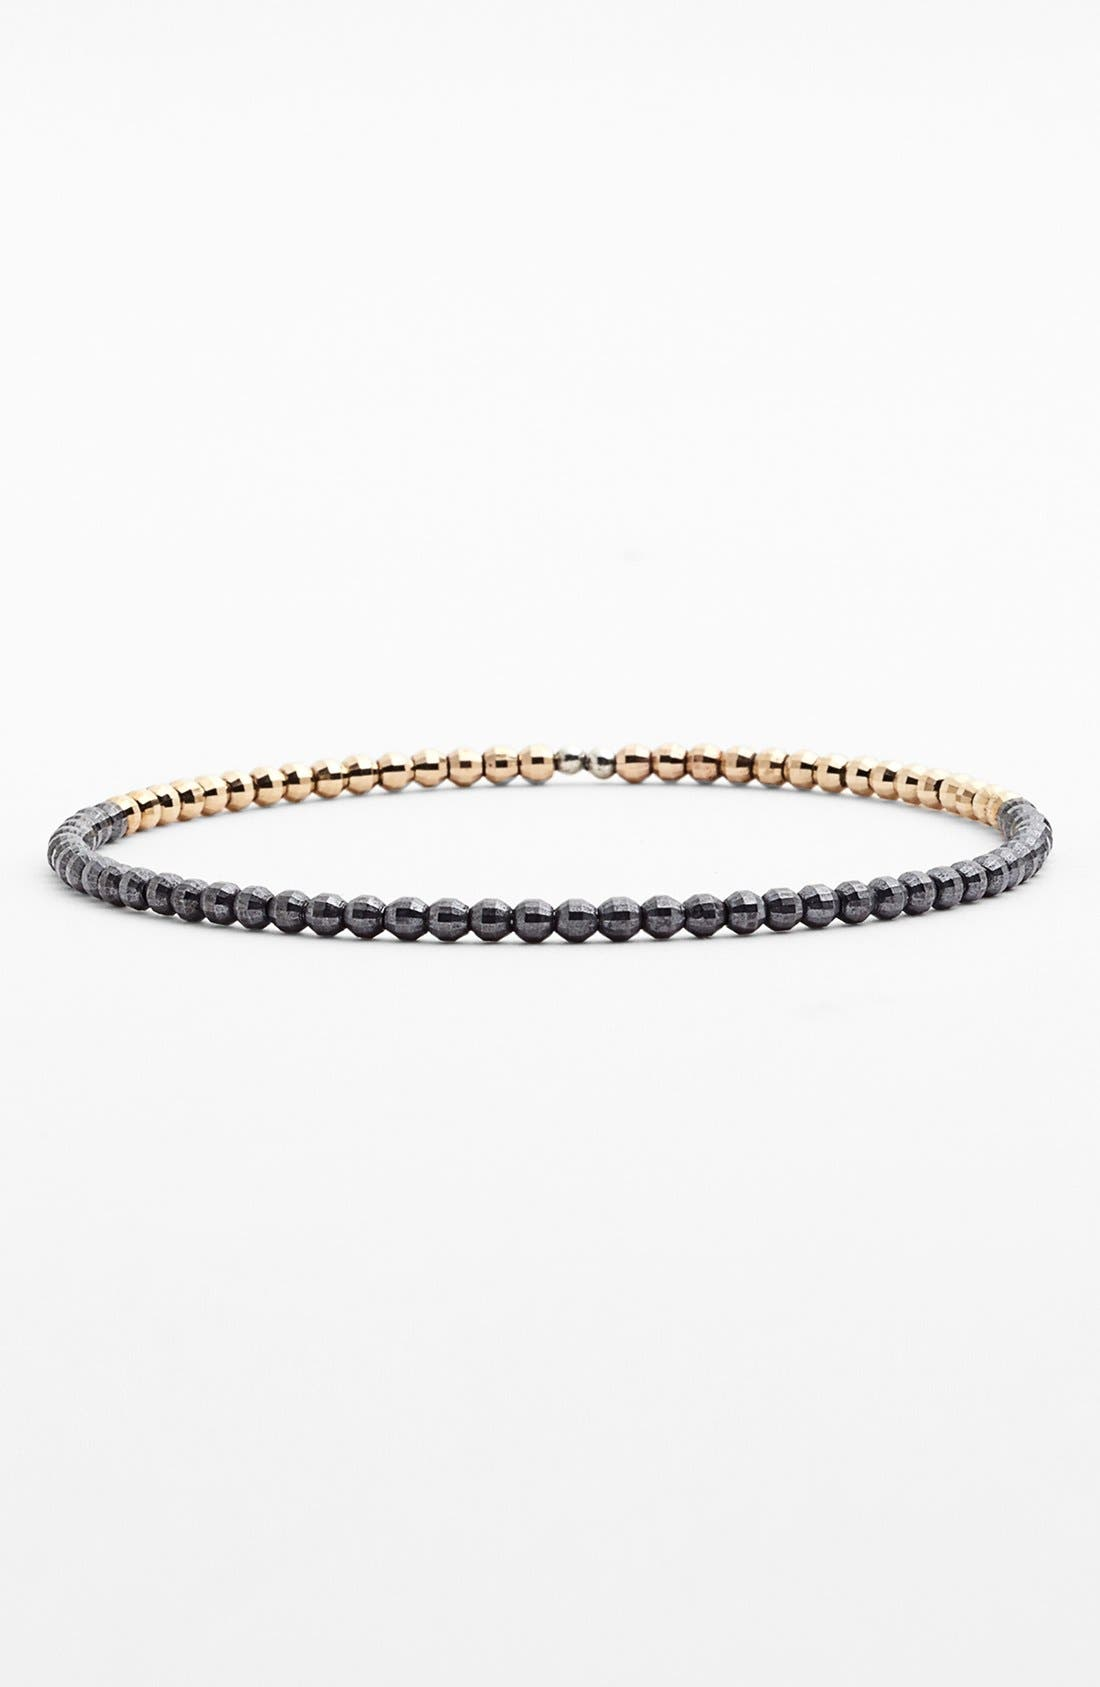 Alternate Image 1 Selected - Mizuki 'Cut Beads' Beaded Bangle